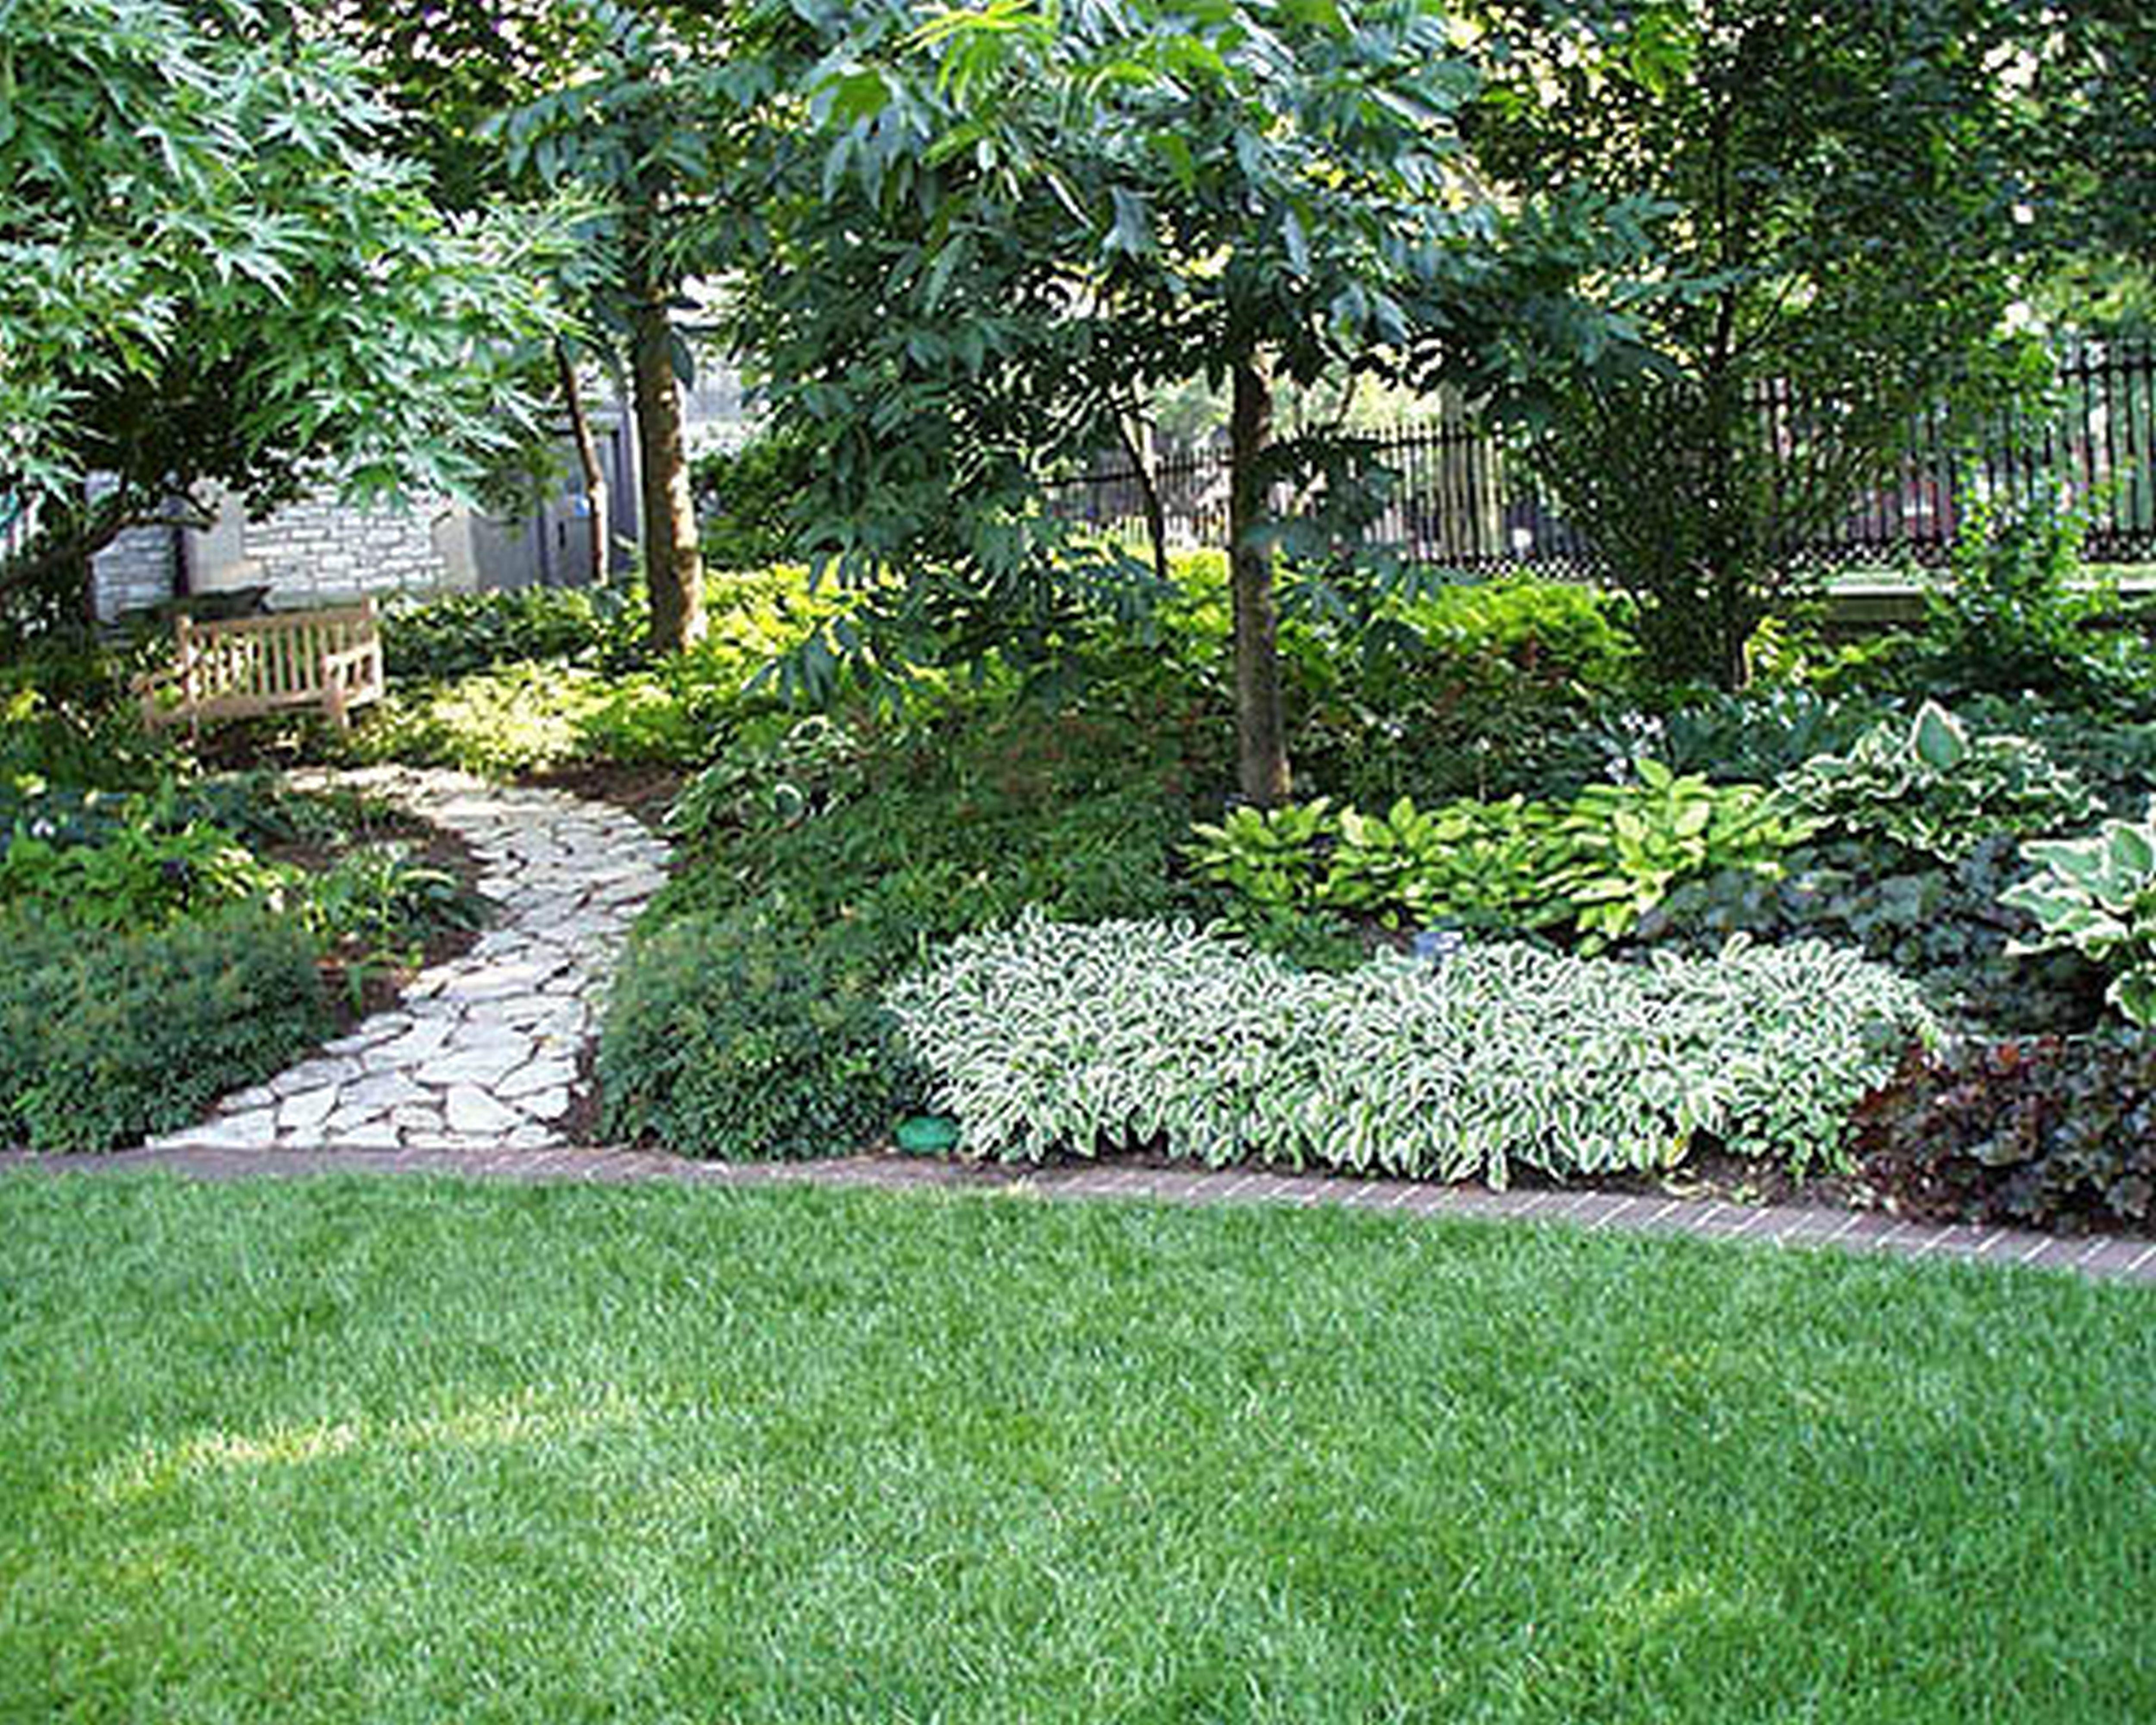 driveway planting ideas nz Google Search Backyard